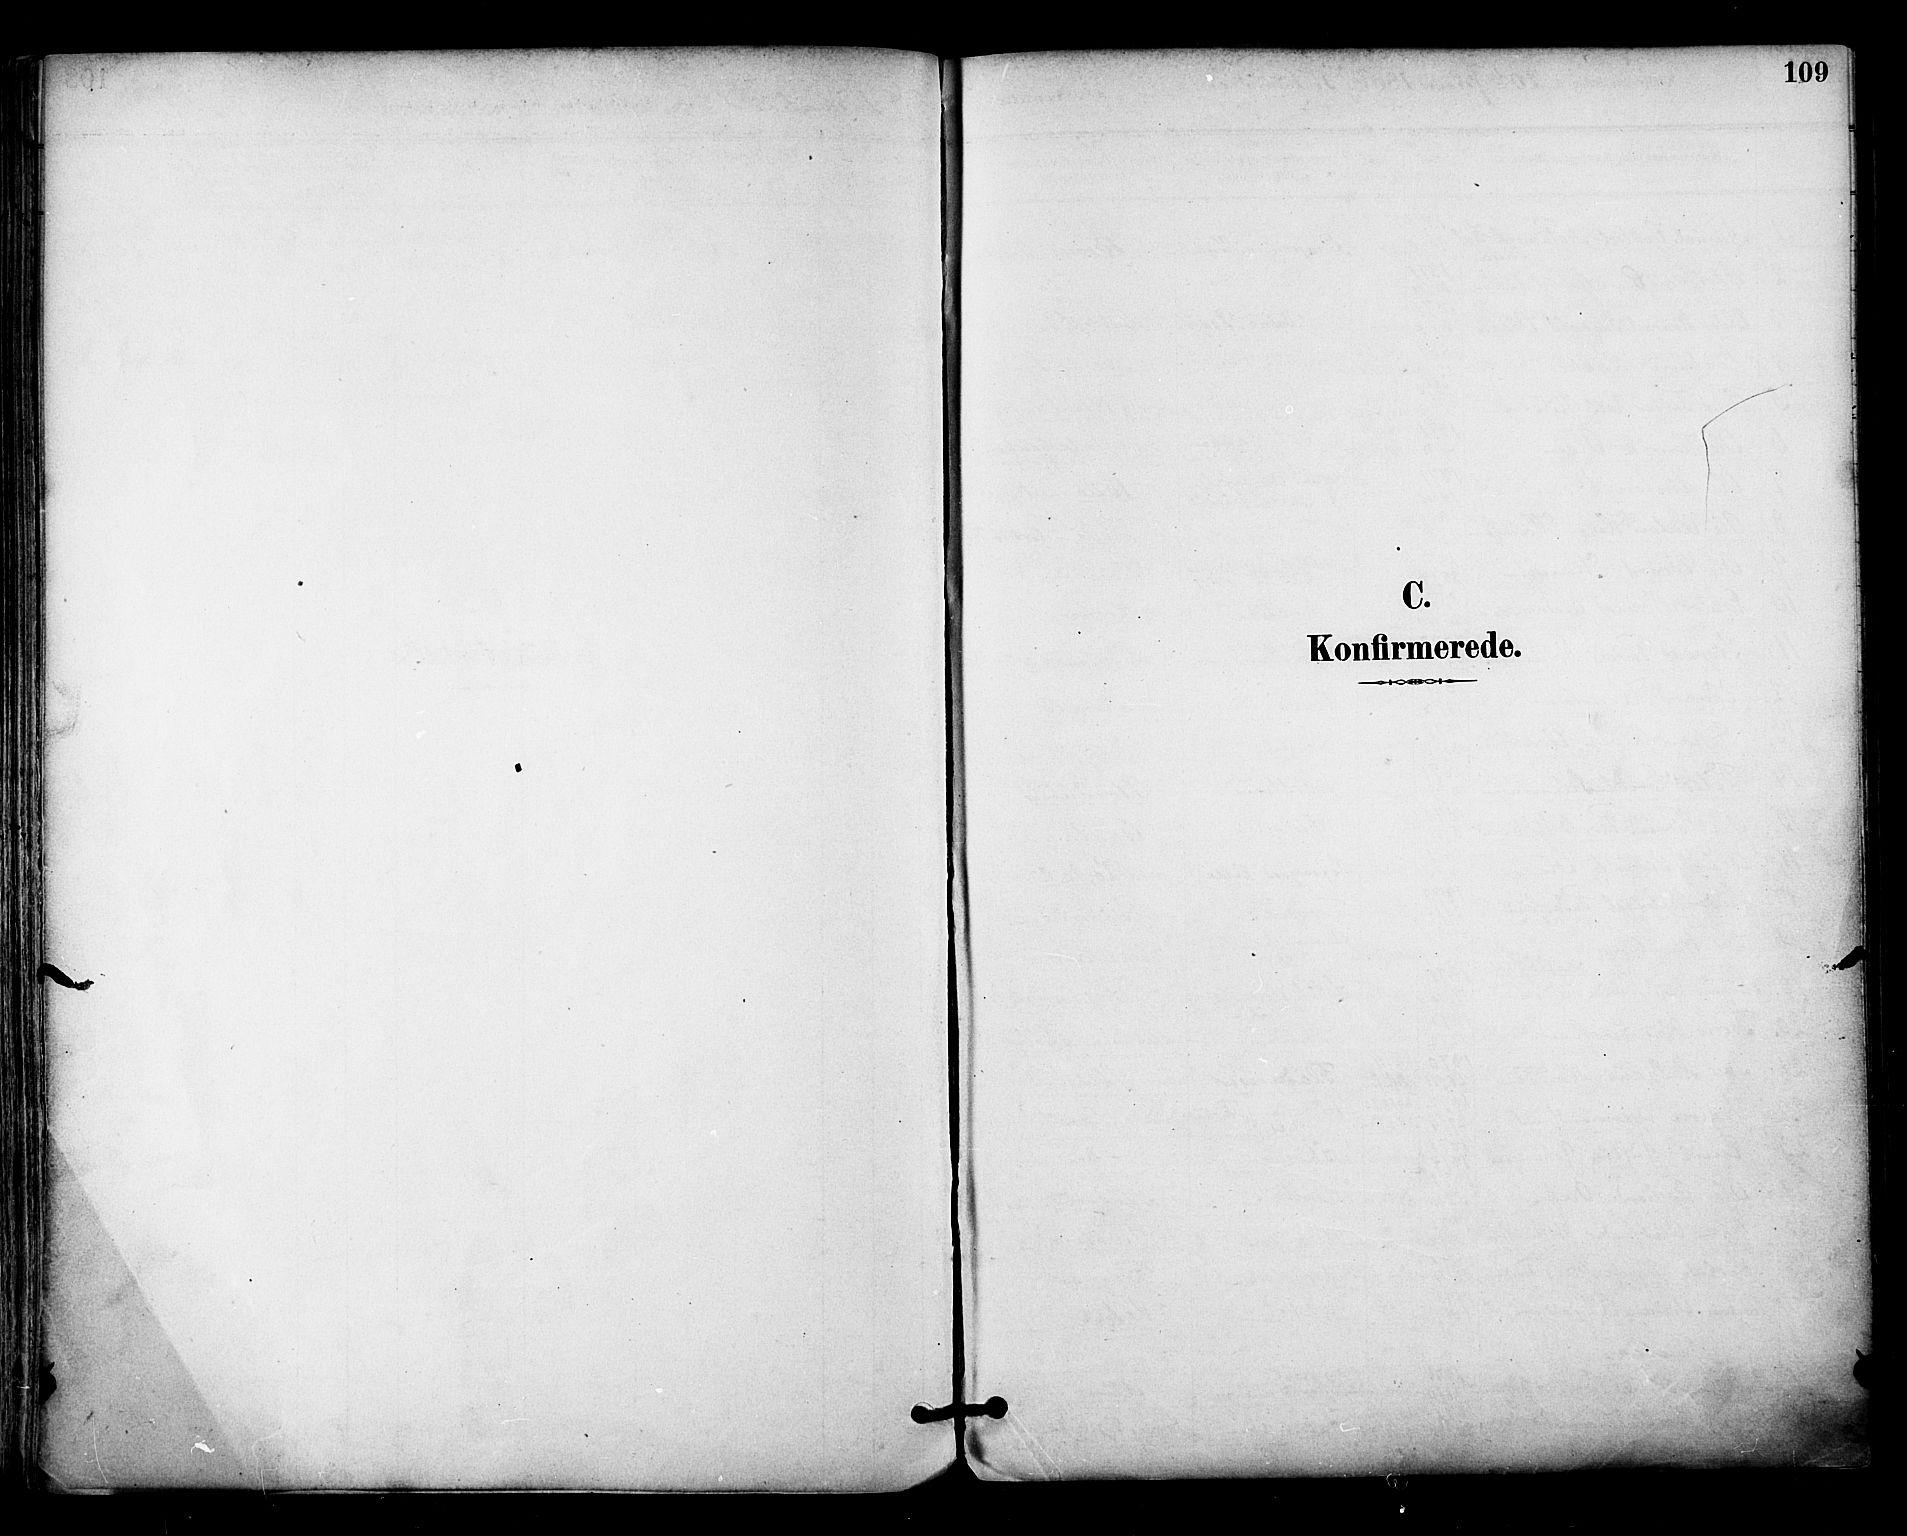 SAT, Ministerialprotokoller, klokkerbøker og fødselsregistre - Nordland, 813/L0200: Ministerialbok nr. 813A10, 1886-1900, s. 109